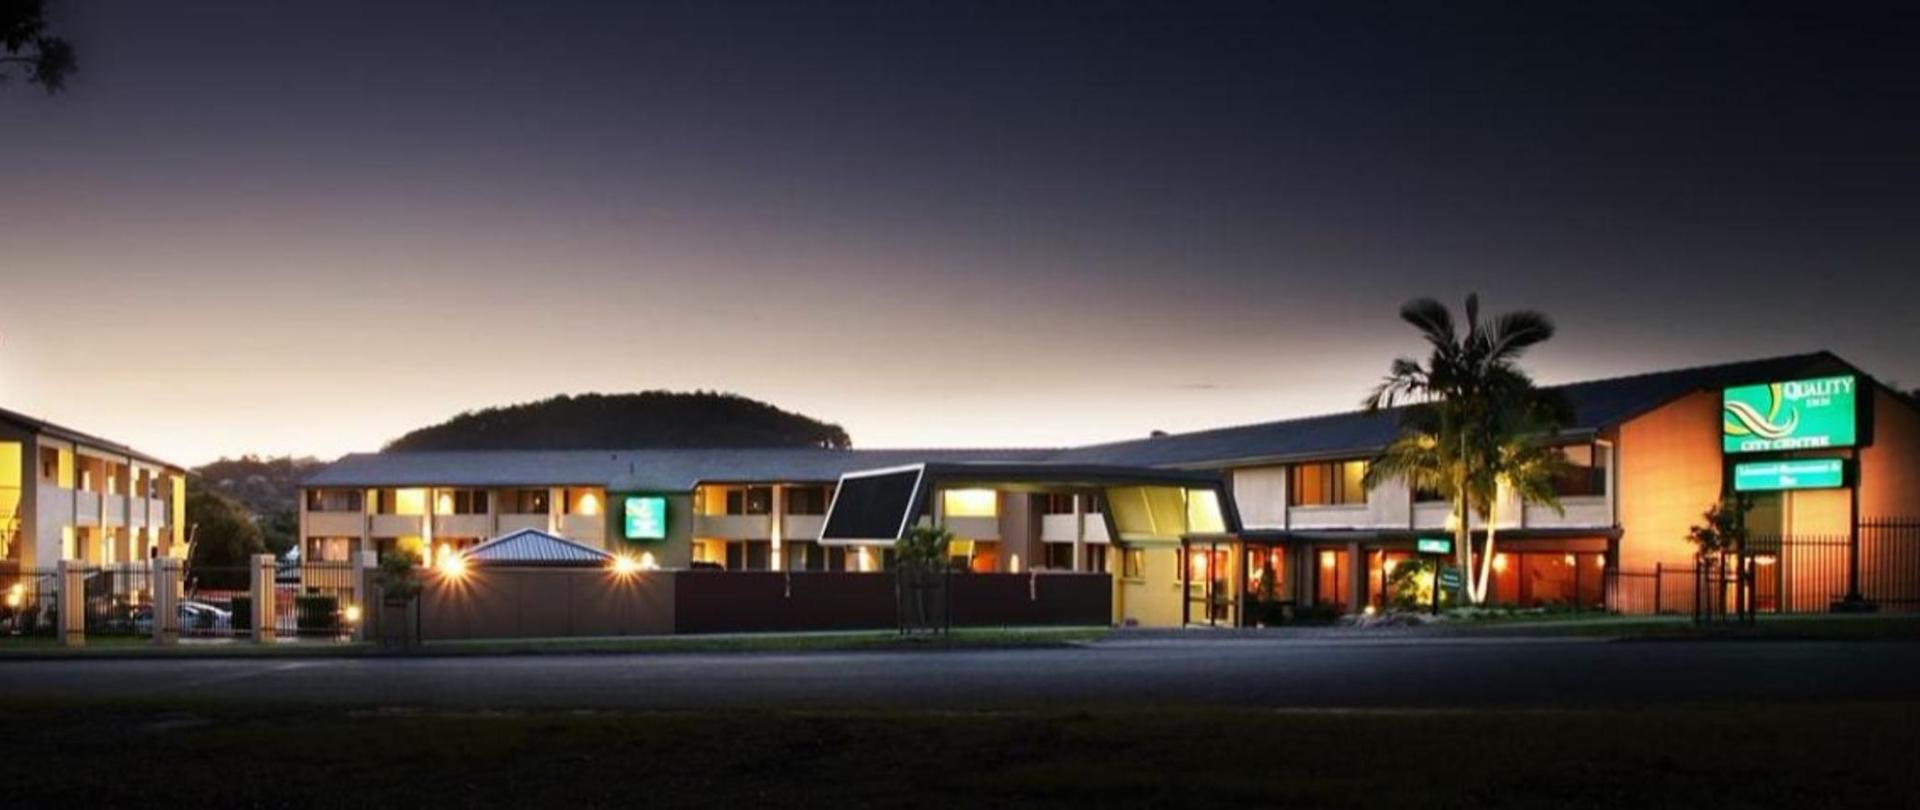 qicc-hotel-exterior.jpg.1140x481_145_0_10703.jpg